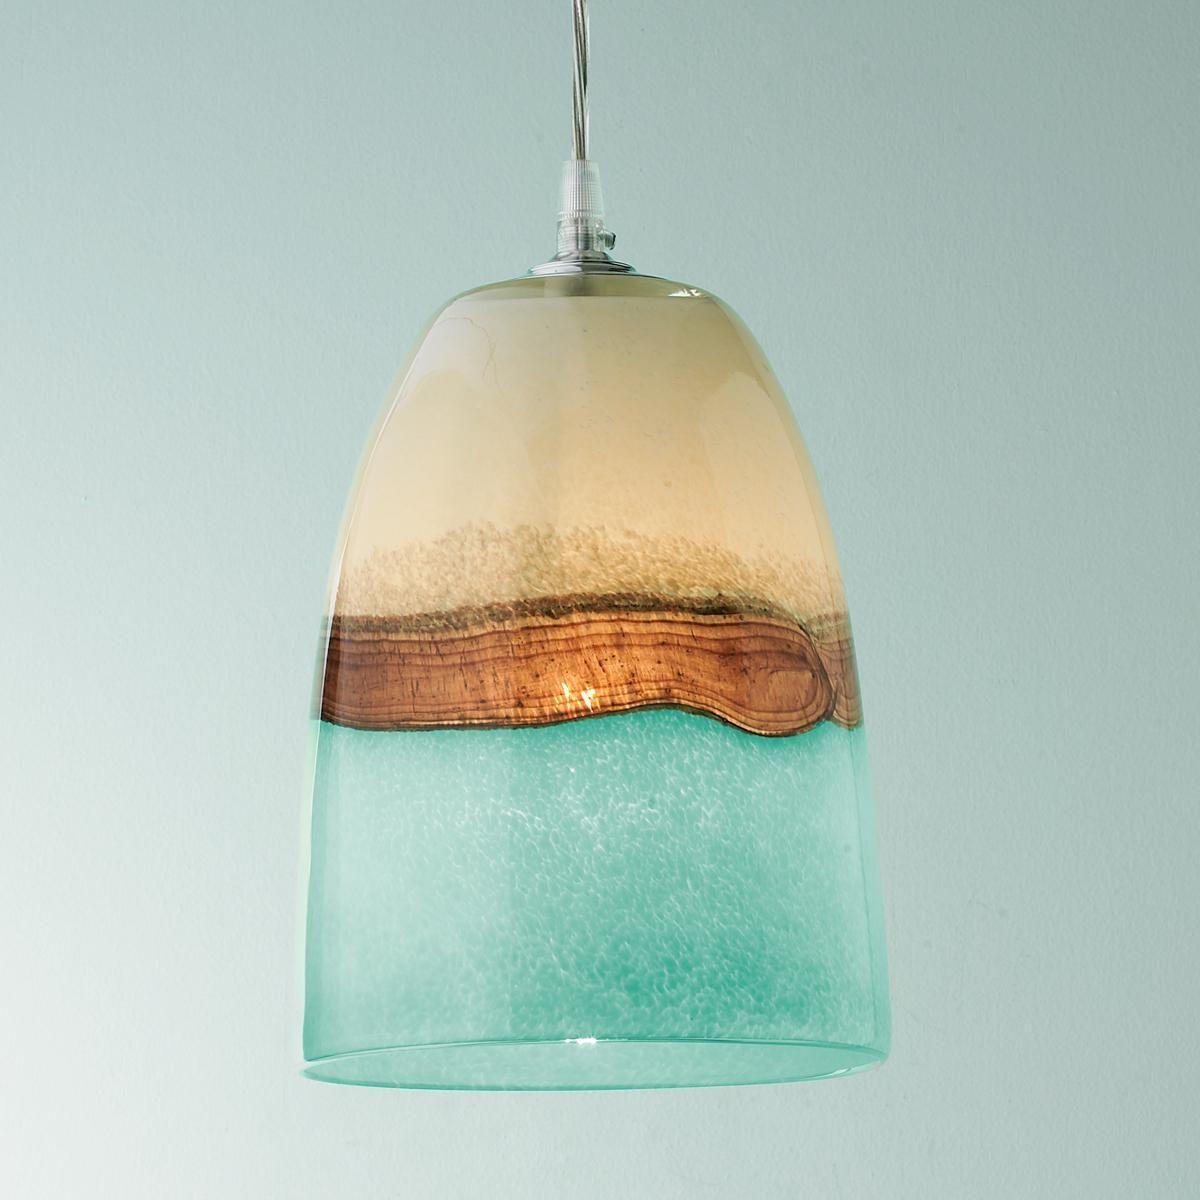 Strata Art Glass Pendant Light